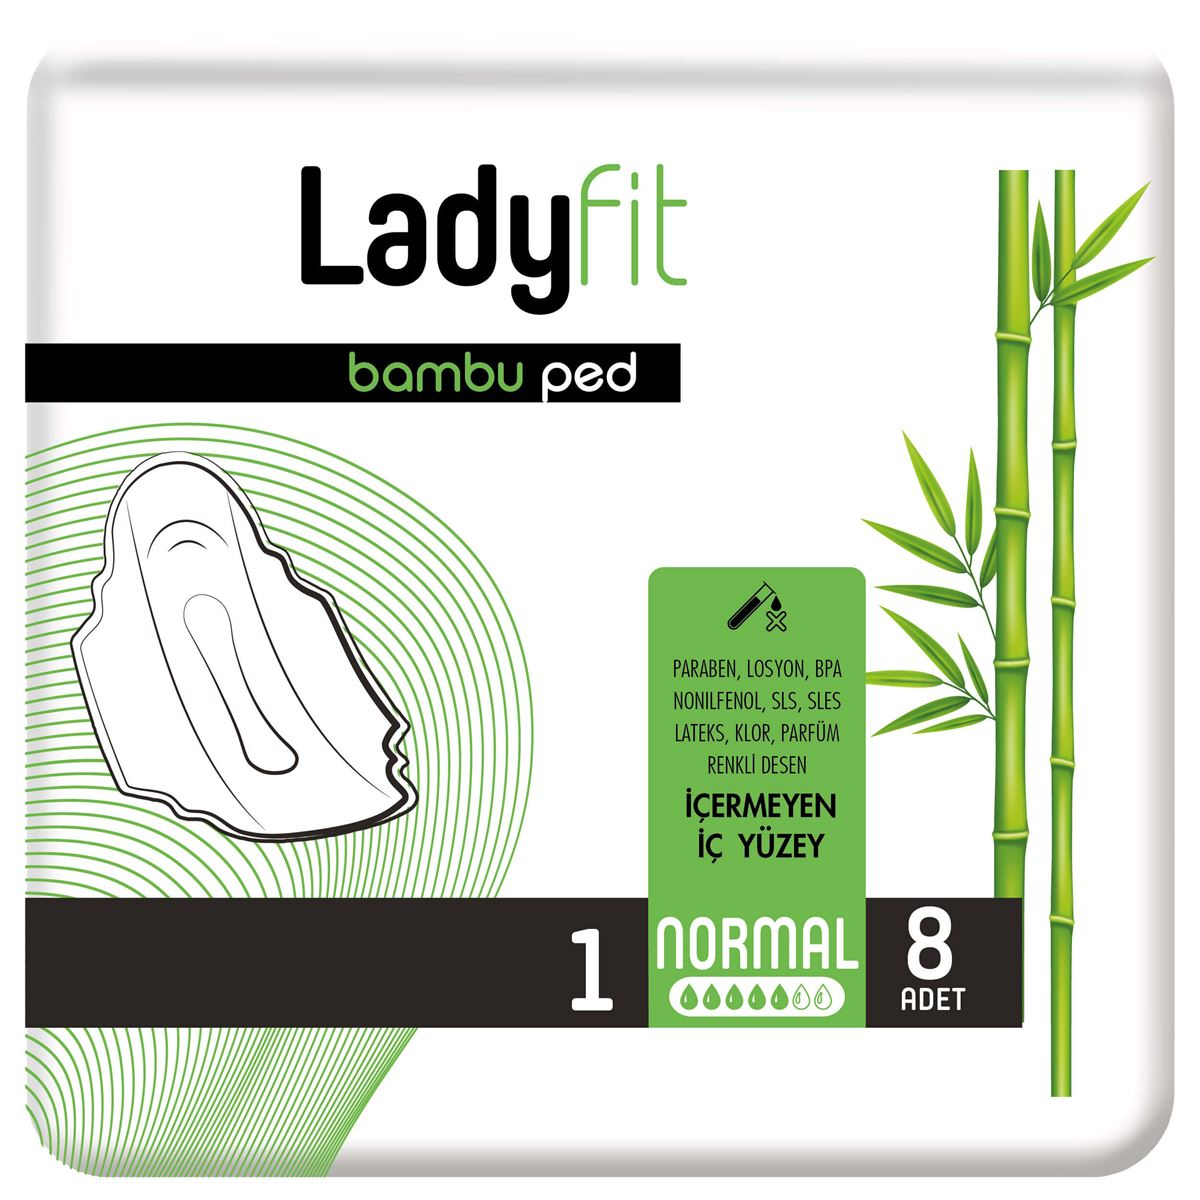 Ladyfit Bambu Ped Standart Normal 8 Ped